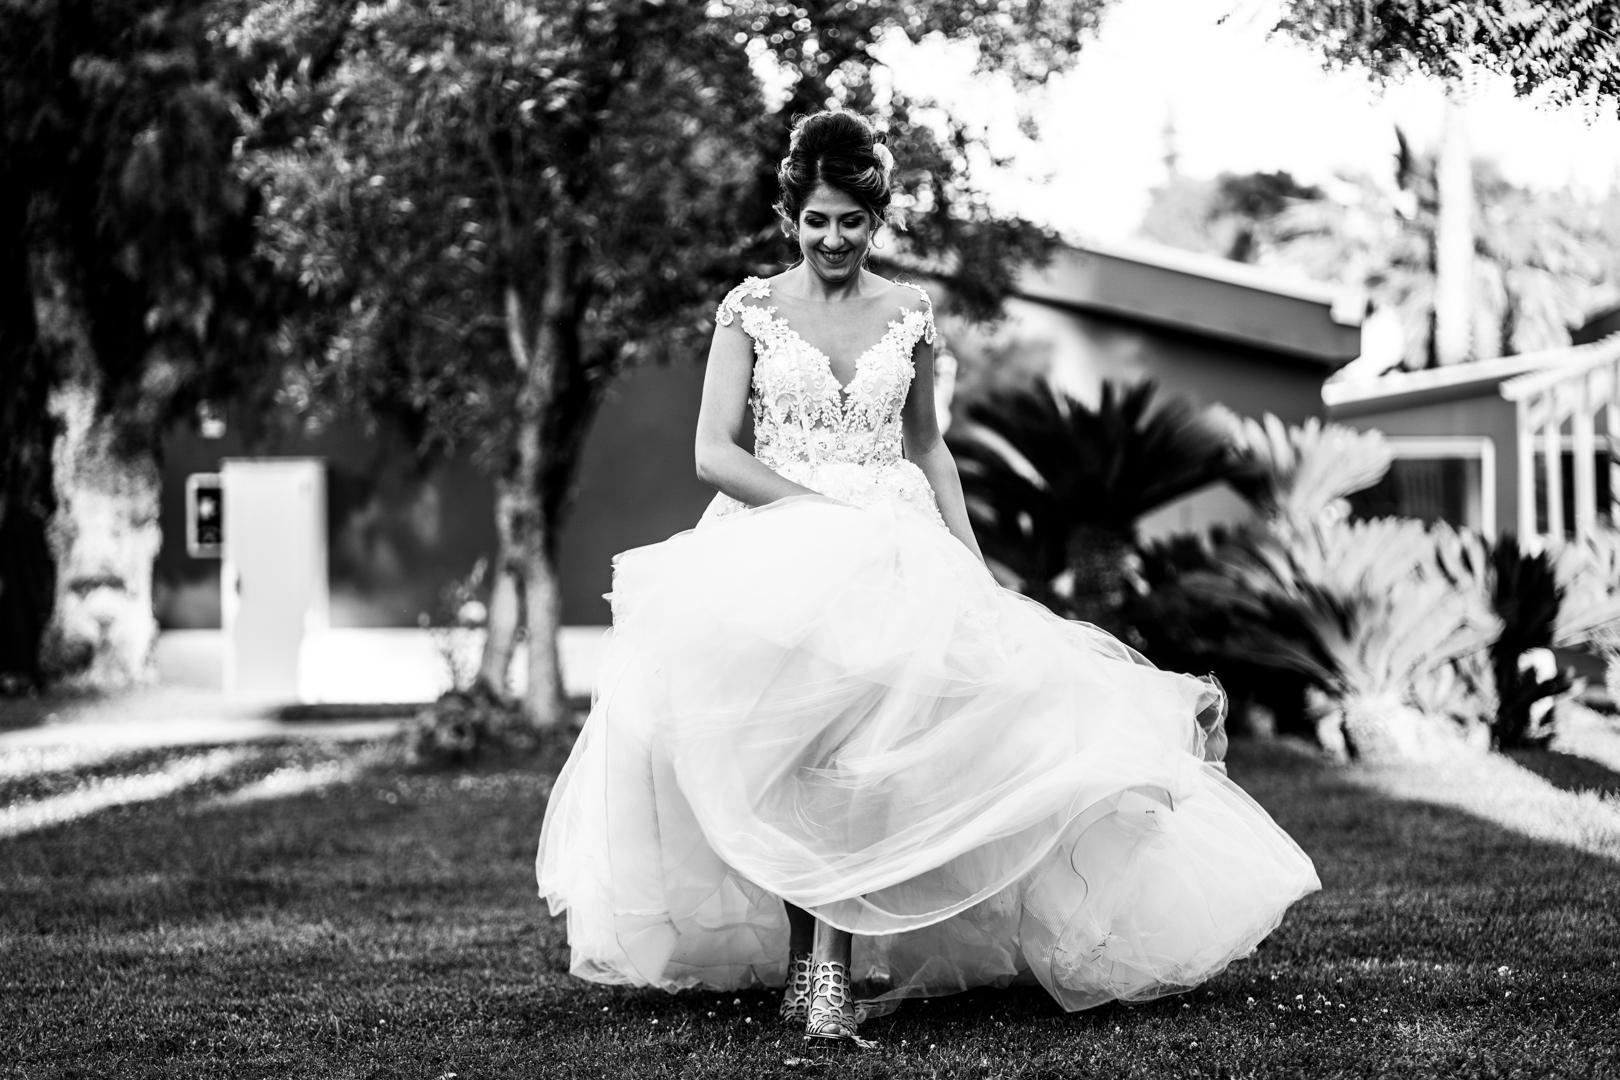 41 gianni-lepore-sposa-bianco-nero-abito